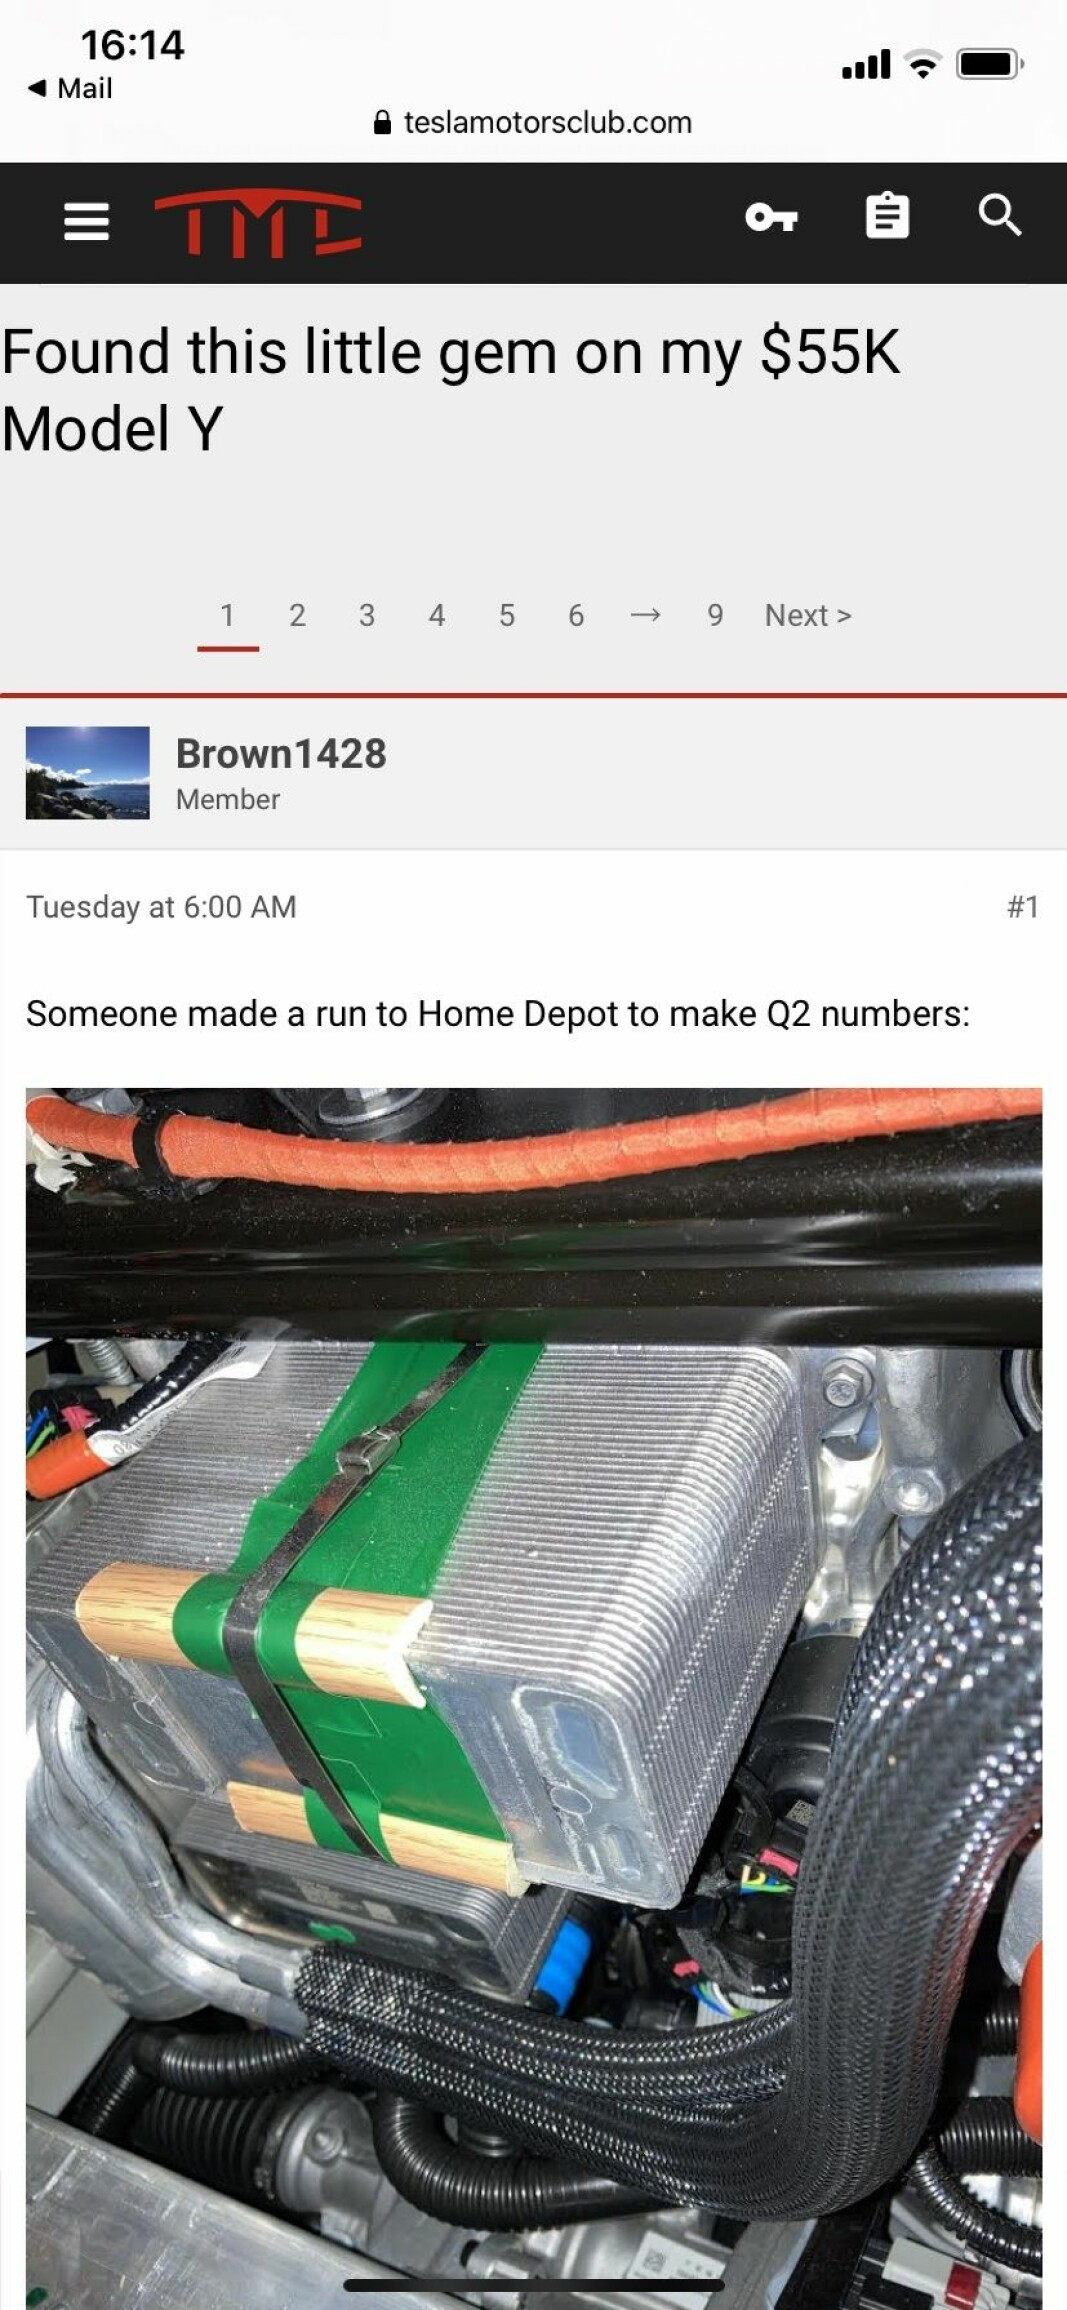 <i>Skjermdump fra Tesla Motors Clubs forum</i>